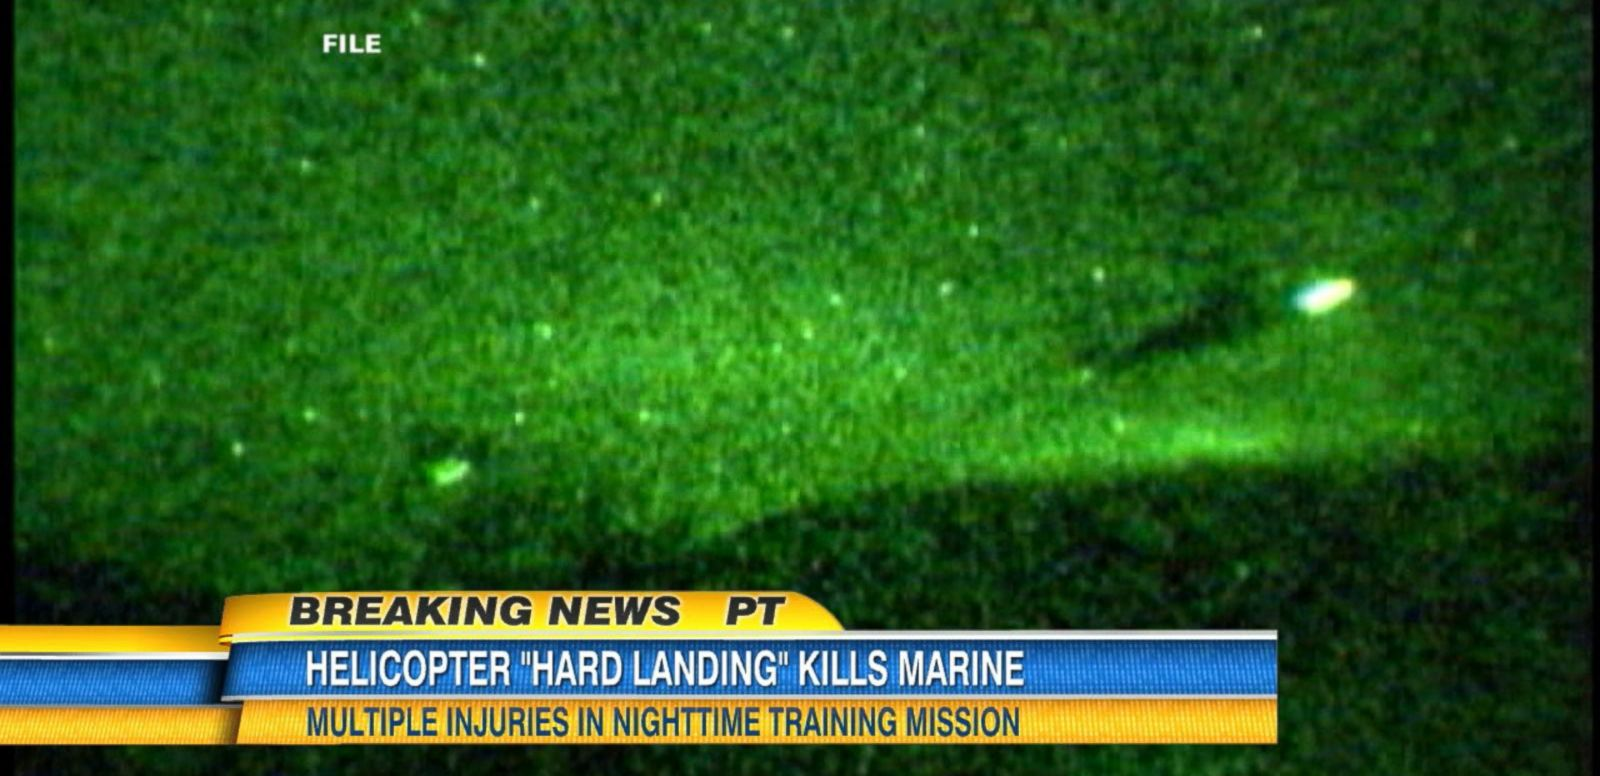 VIDEO: Helicopter 'Hard Landing' Kills Marine